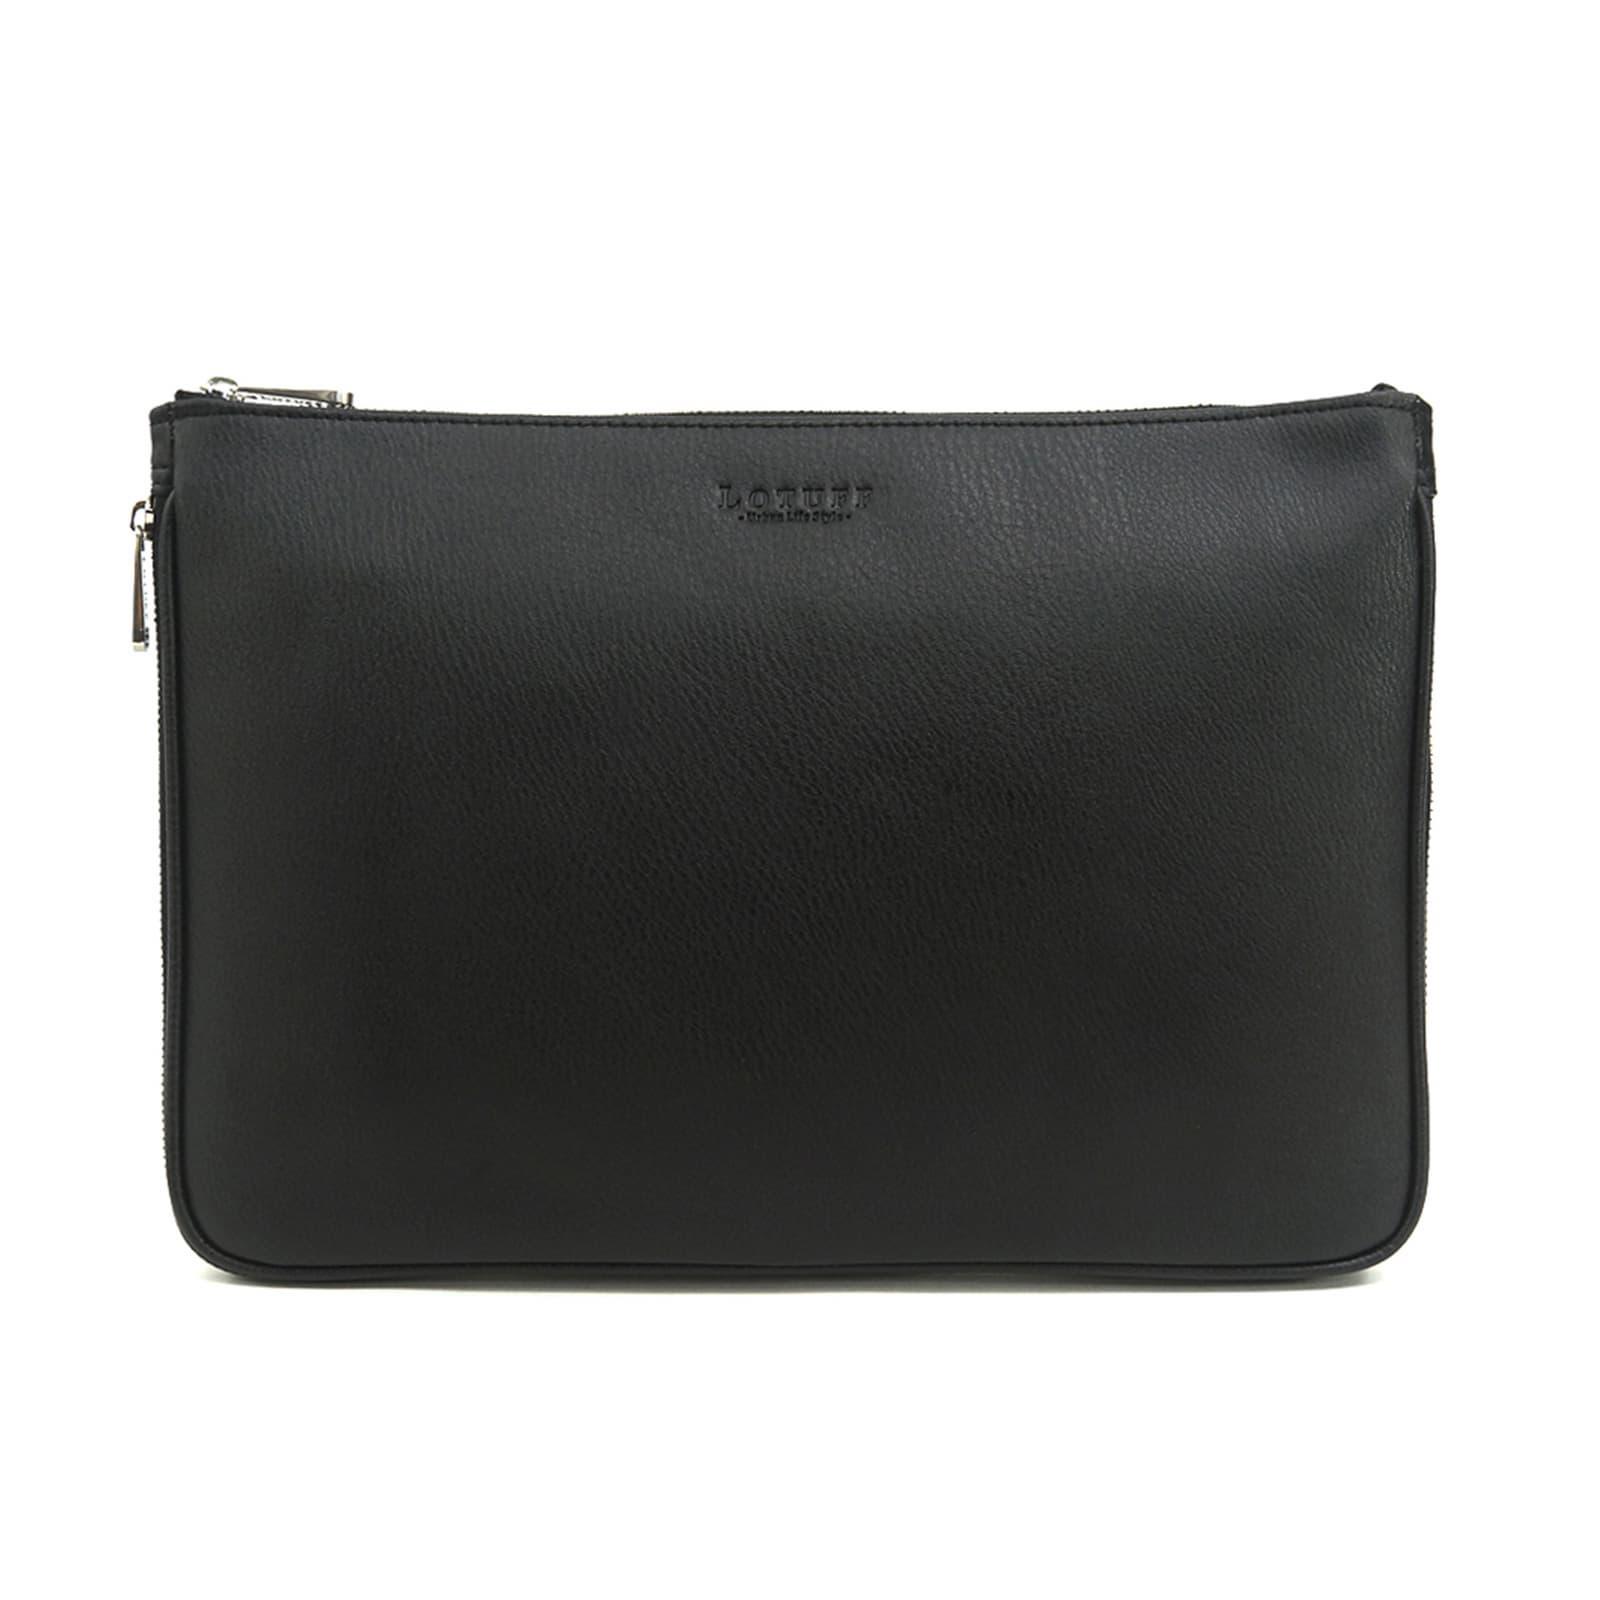 LOTUFF Genuine Leather Clutch bag_ Cross Bag LO_3128 6 Color